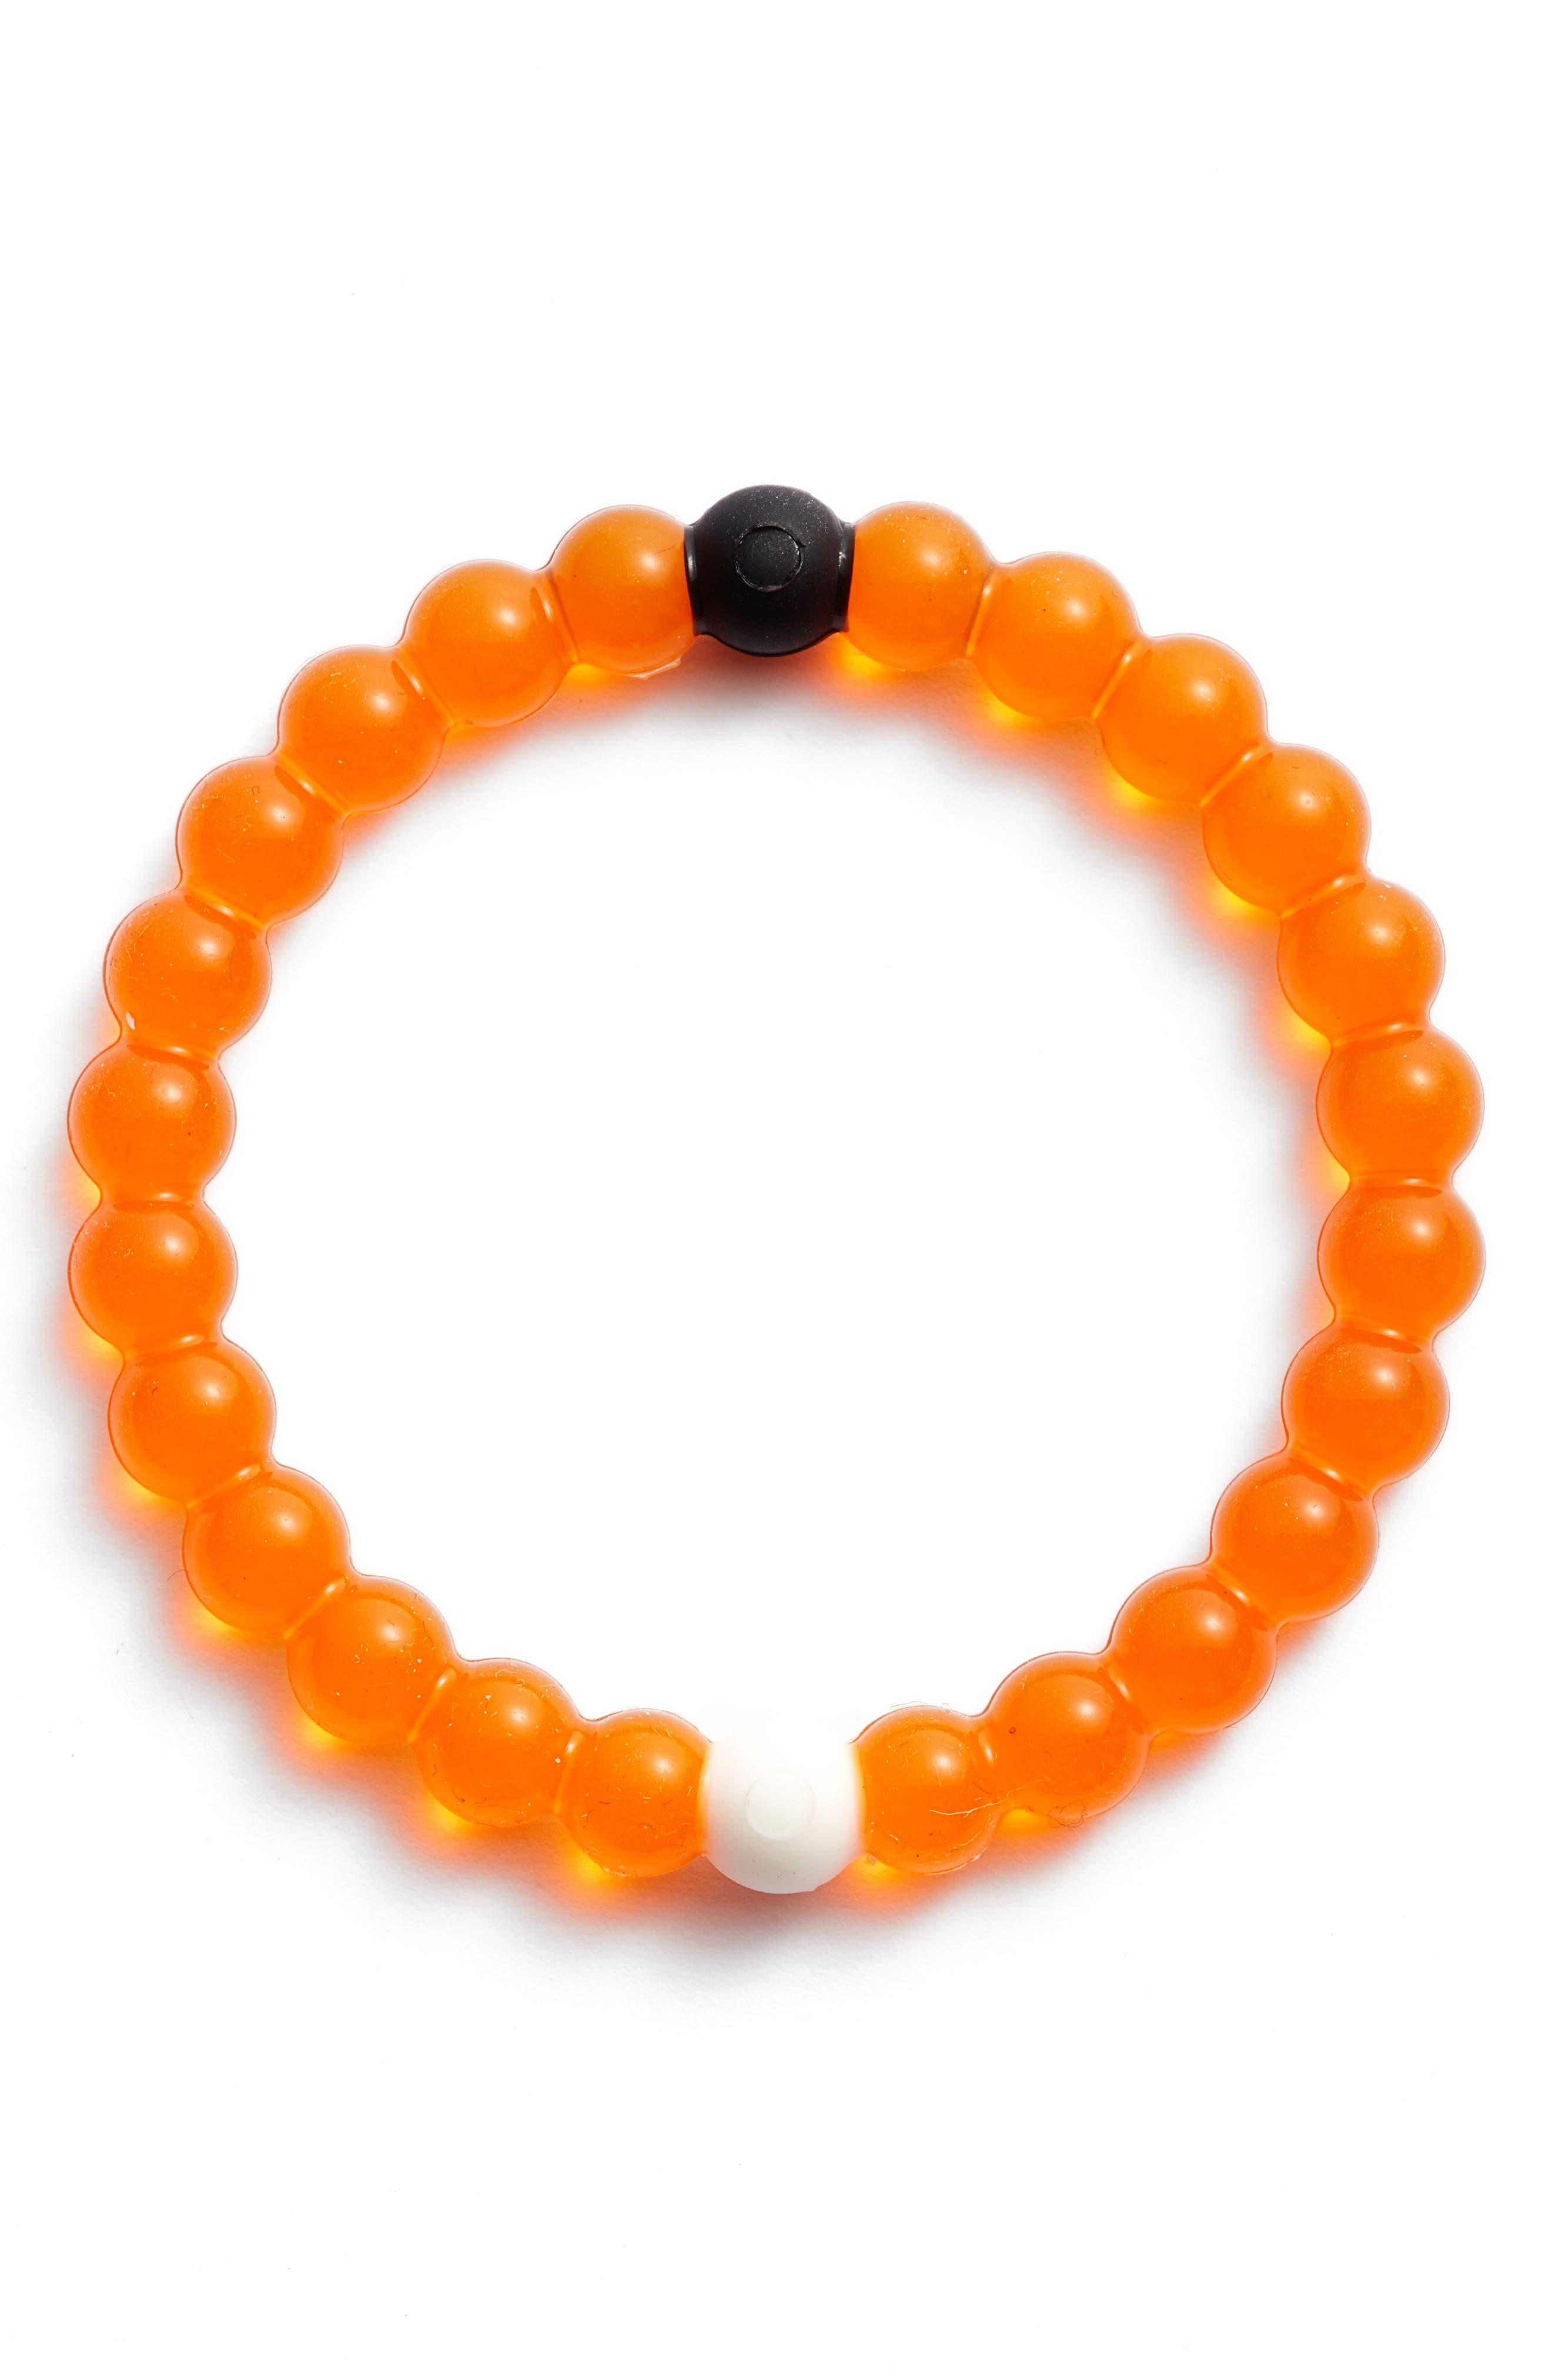 Mental Health Awareness Orange Bracelet,                             Main thumbnail 1, color,                             800